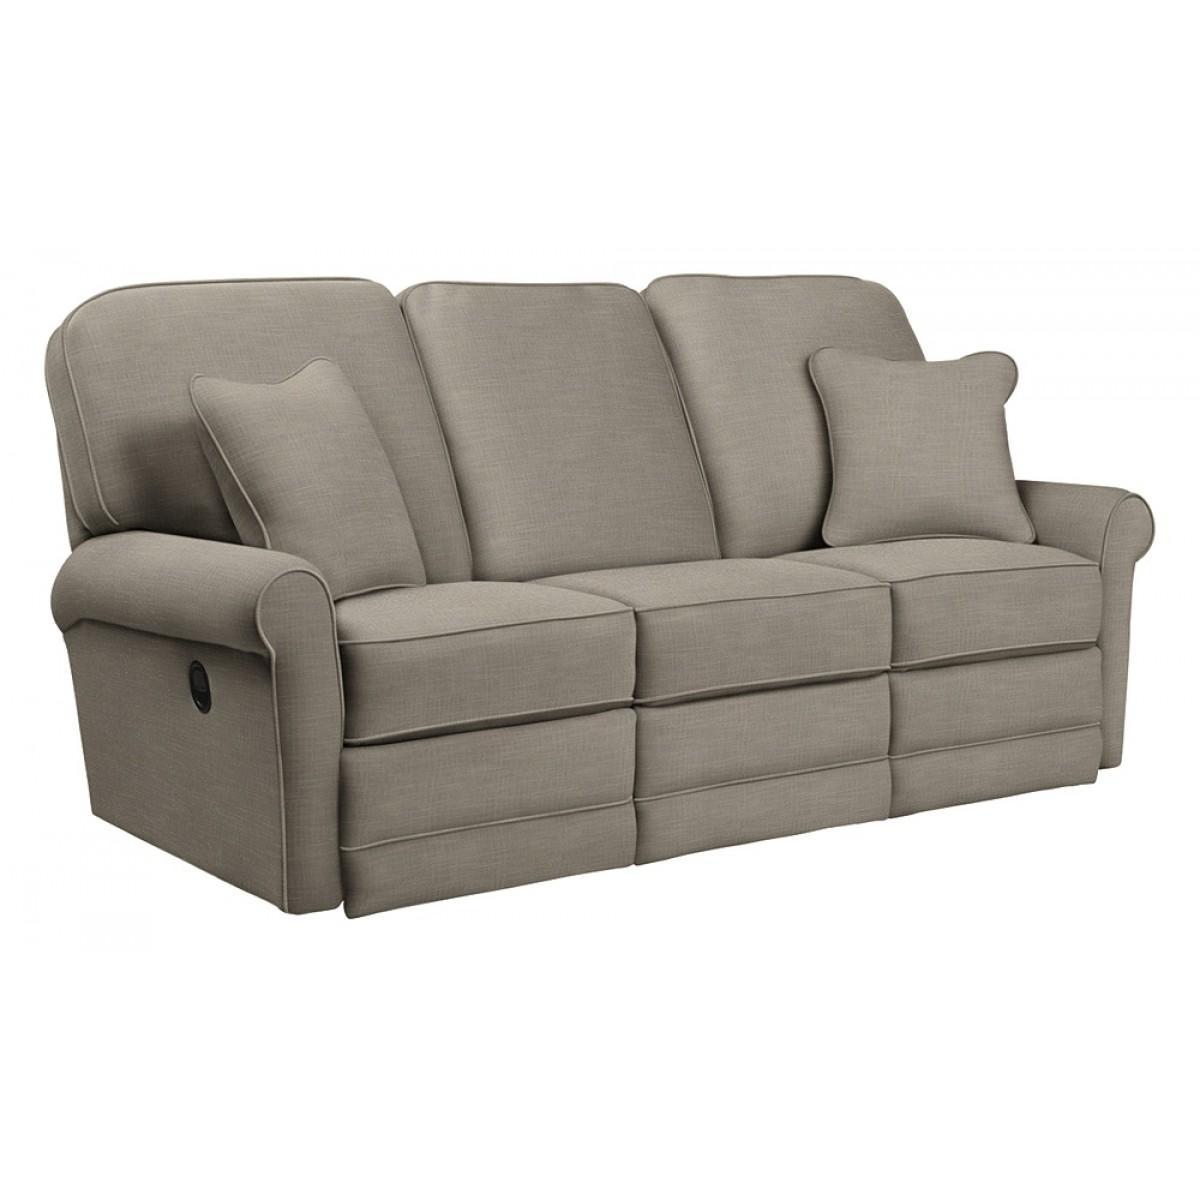 Z Boy Addison La Z Time® Full Reclining Sofa For Lazy Boy Sofas (Image 20 of 20)